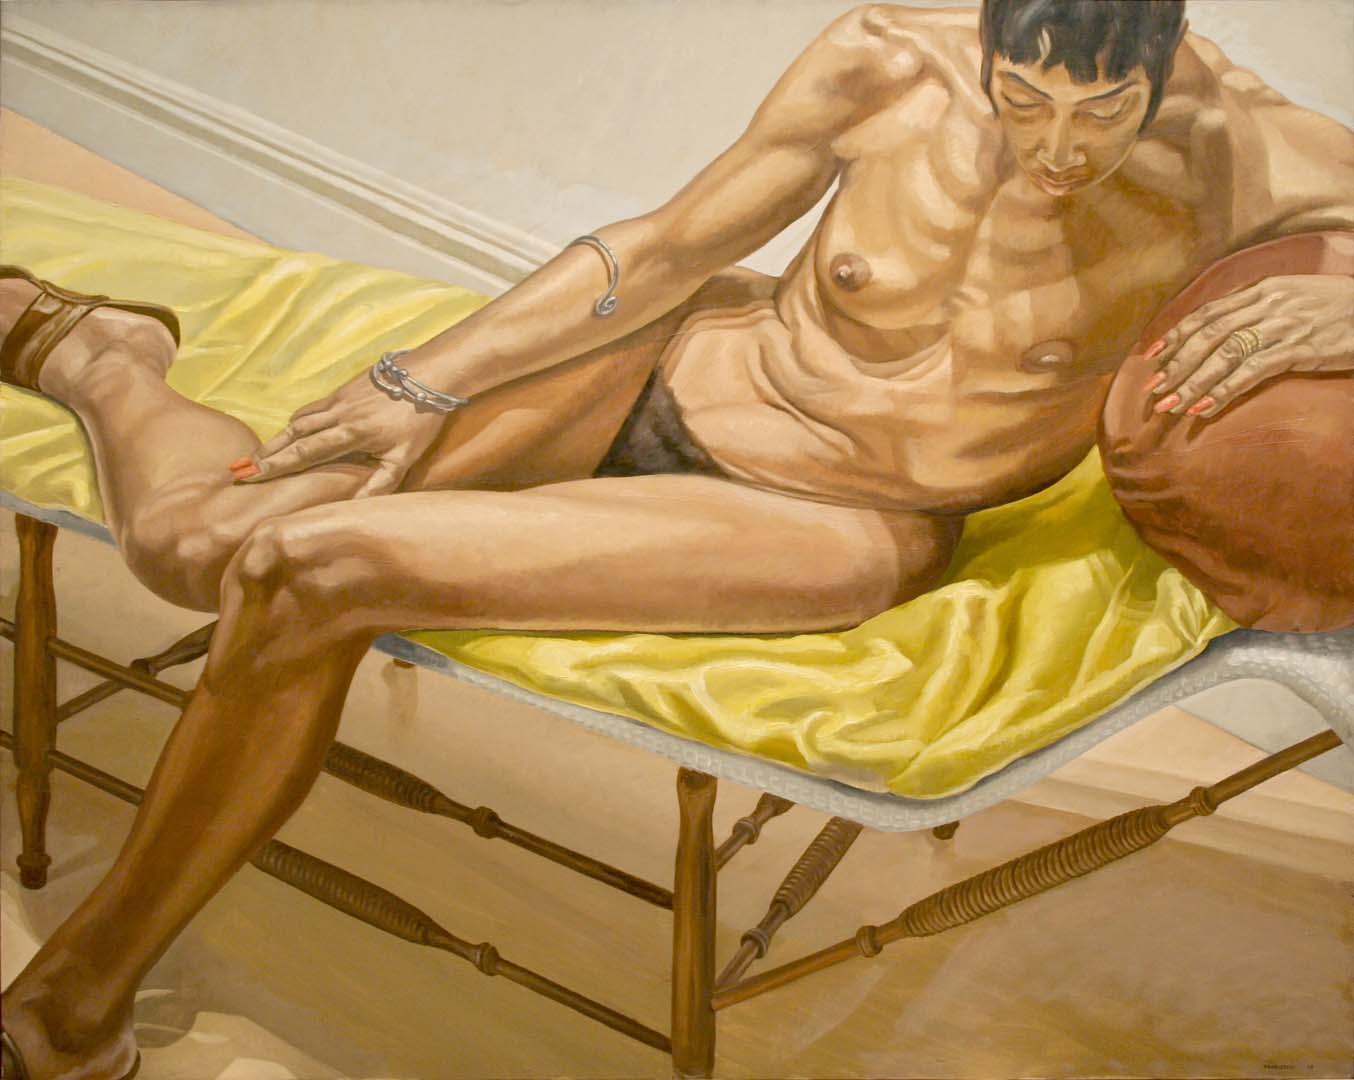 "1969 Reclining Female on Yellow Drape Oil on Canvas 46"" x 60"""